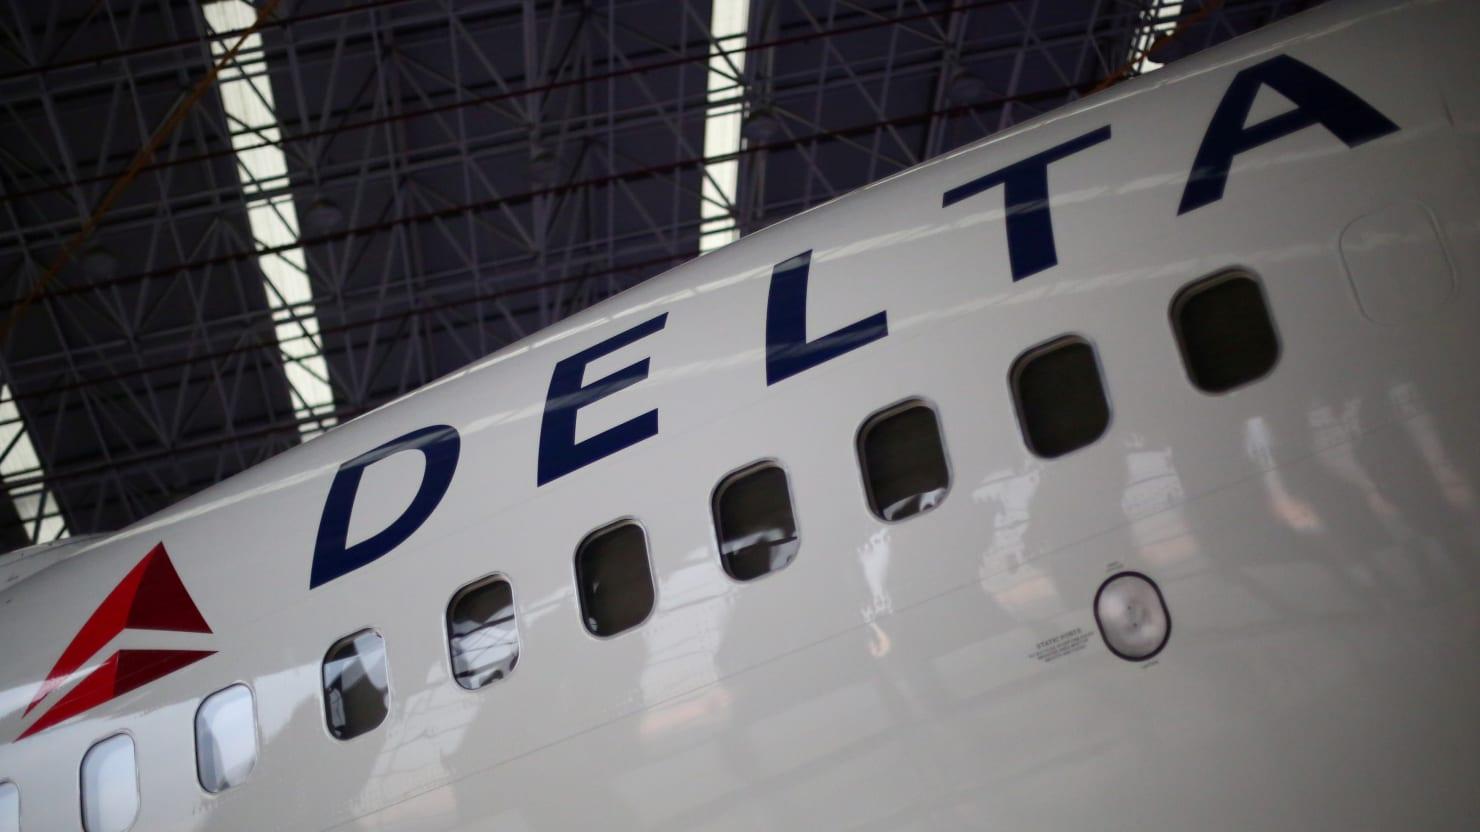 Delta Adding Naloxone to On-Board Emergency Kits After Passenger Overdoses on Flight